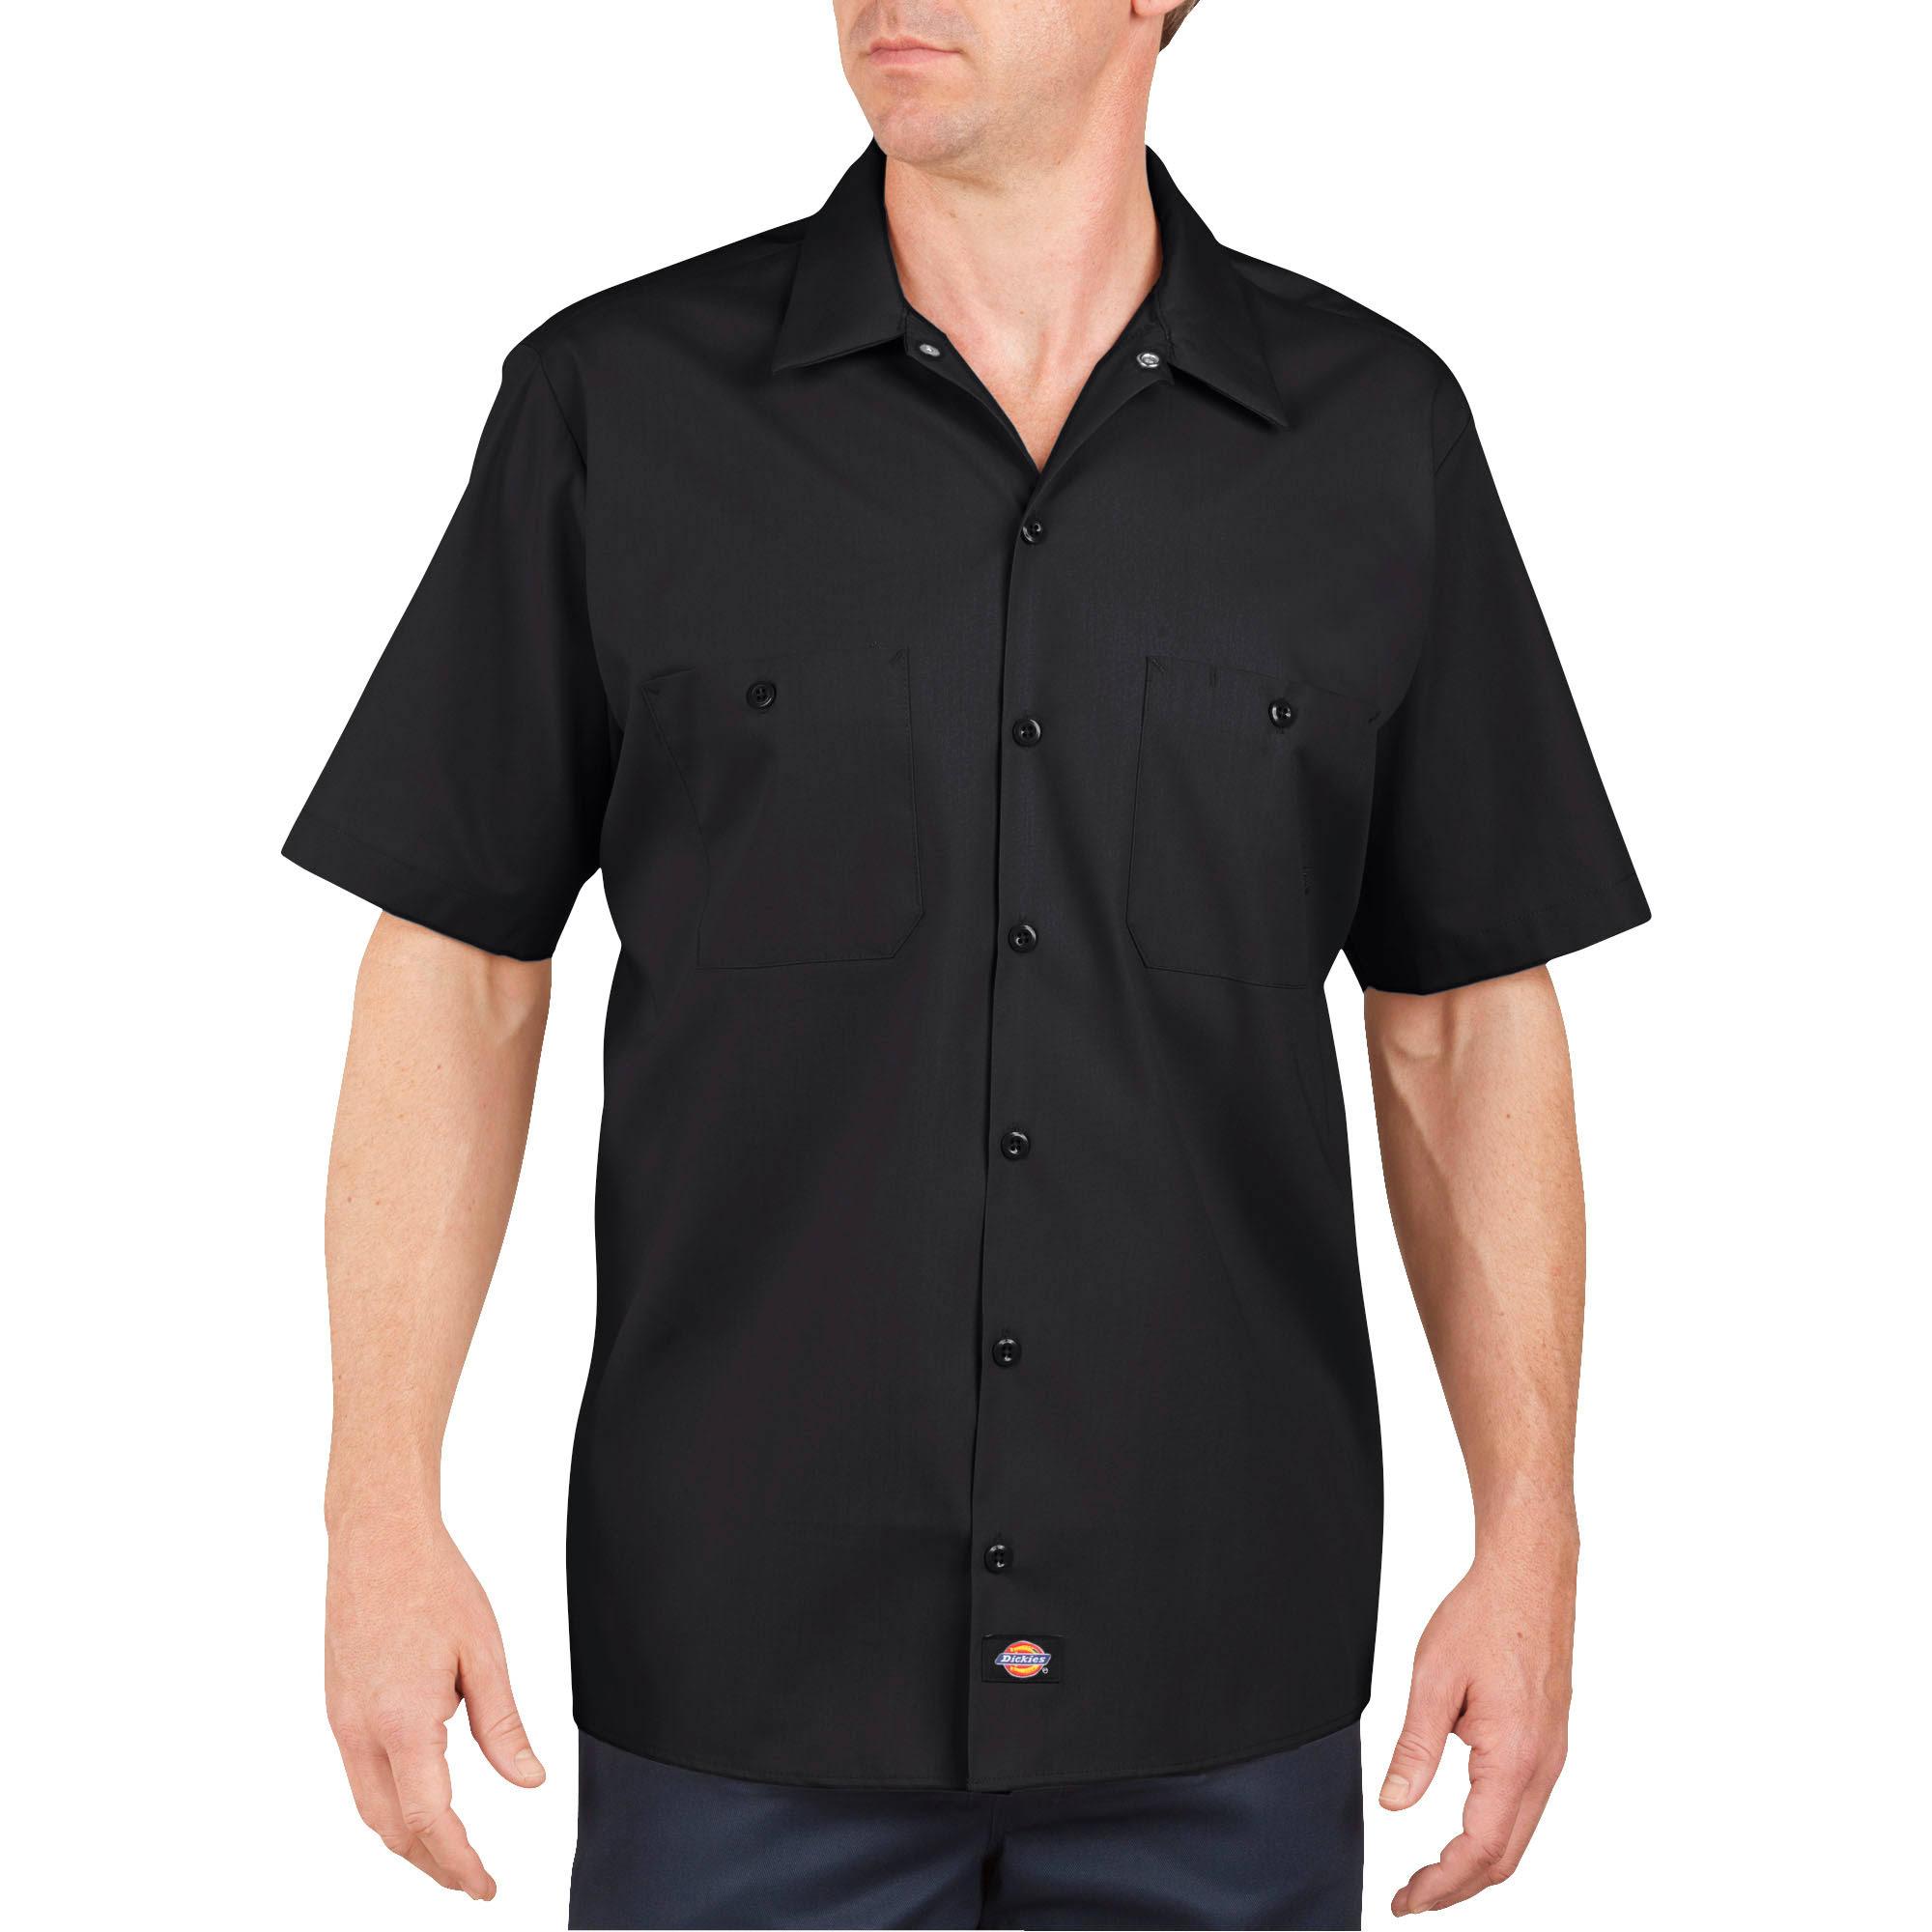 2x Slv Popeline Dickies hemd Ls535bk Schwarz Kurzes 2xl Tnqx47B